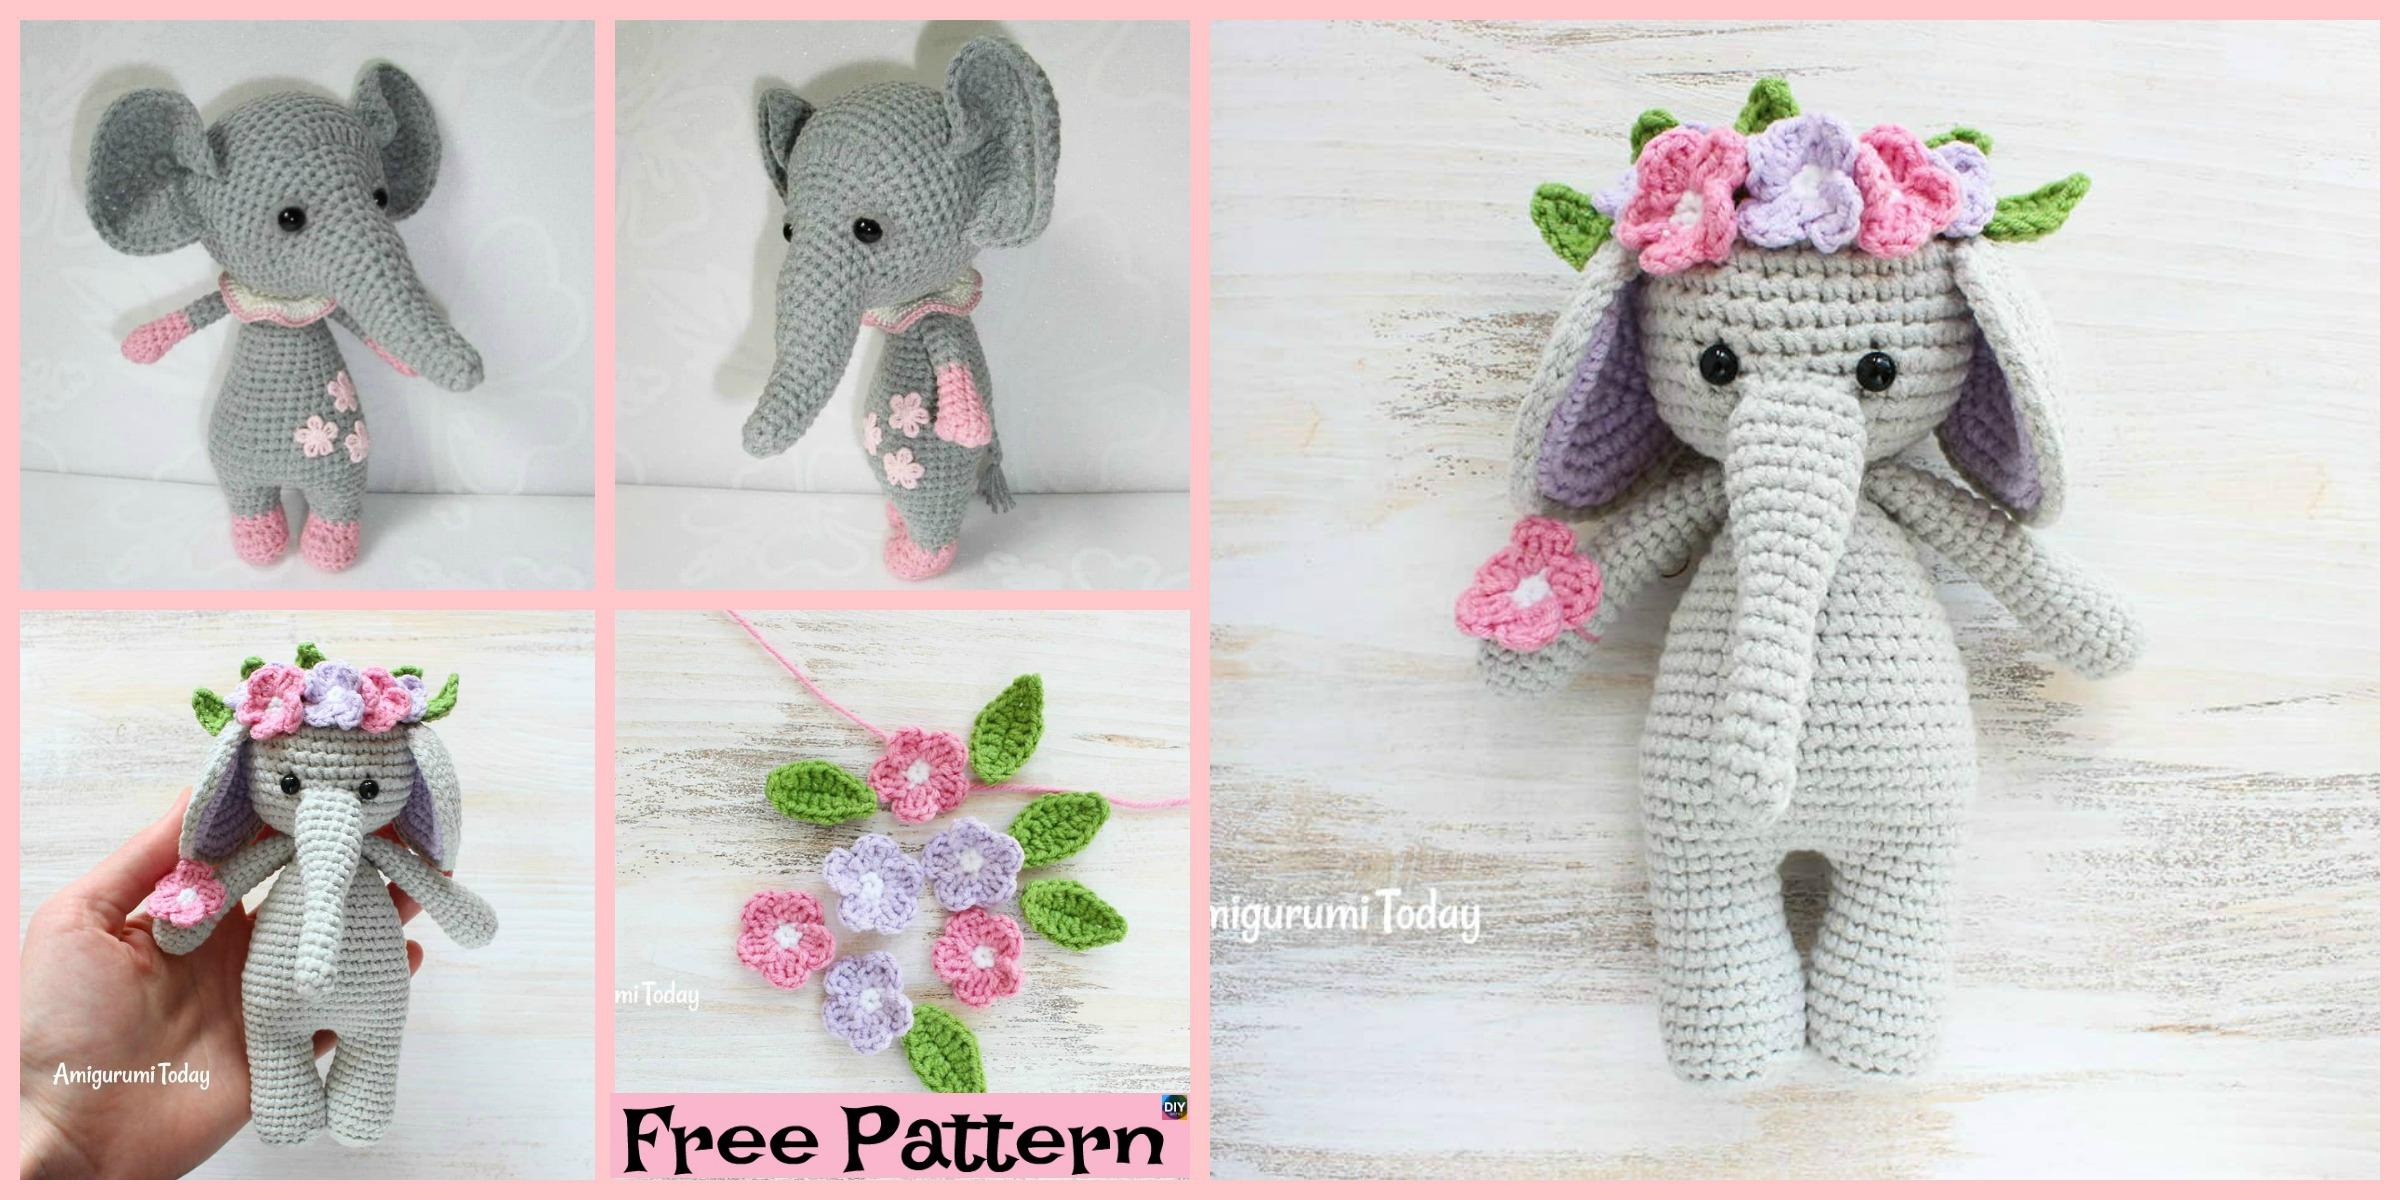 Crochet Baby Elephant Amigurumi - Free Patterns - DIY 4 EVER